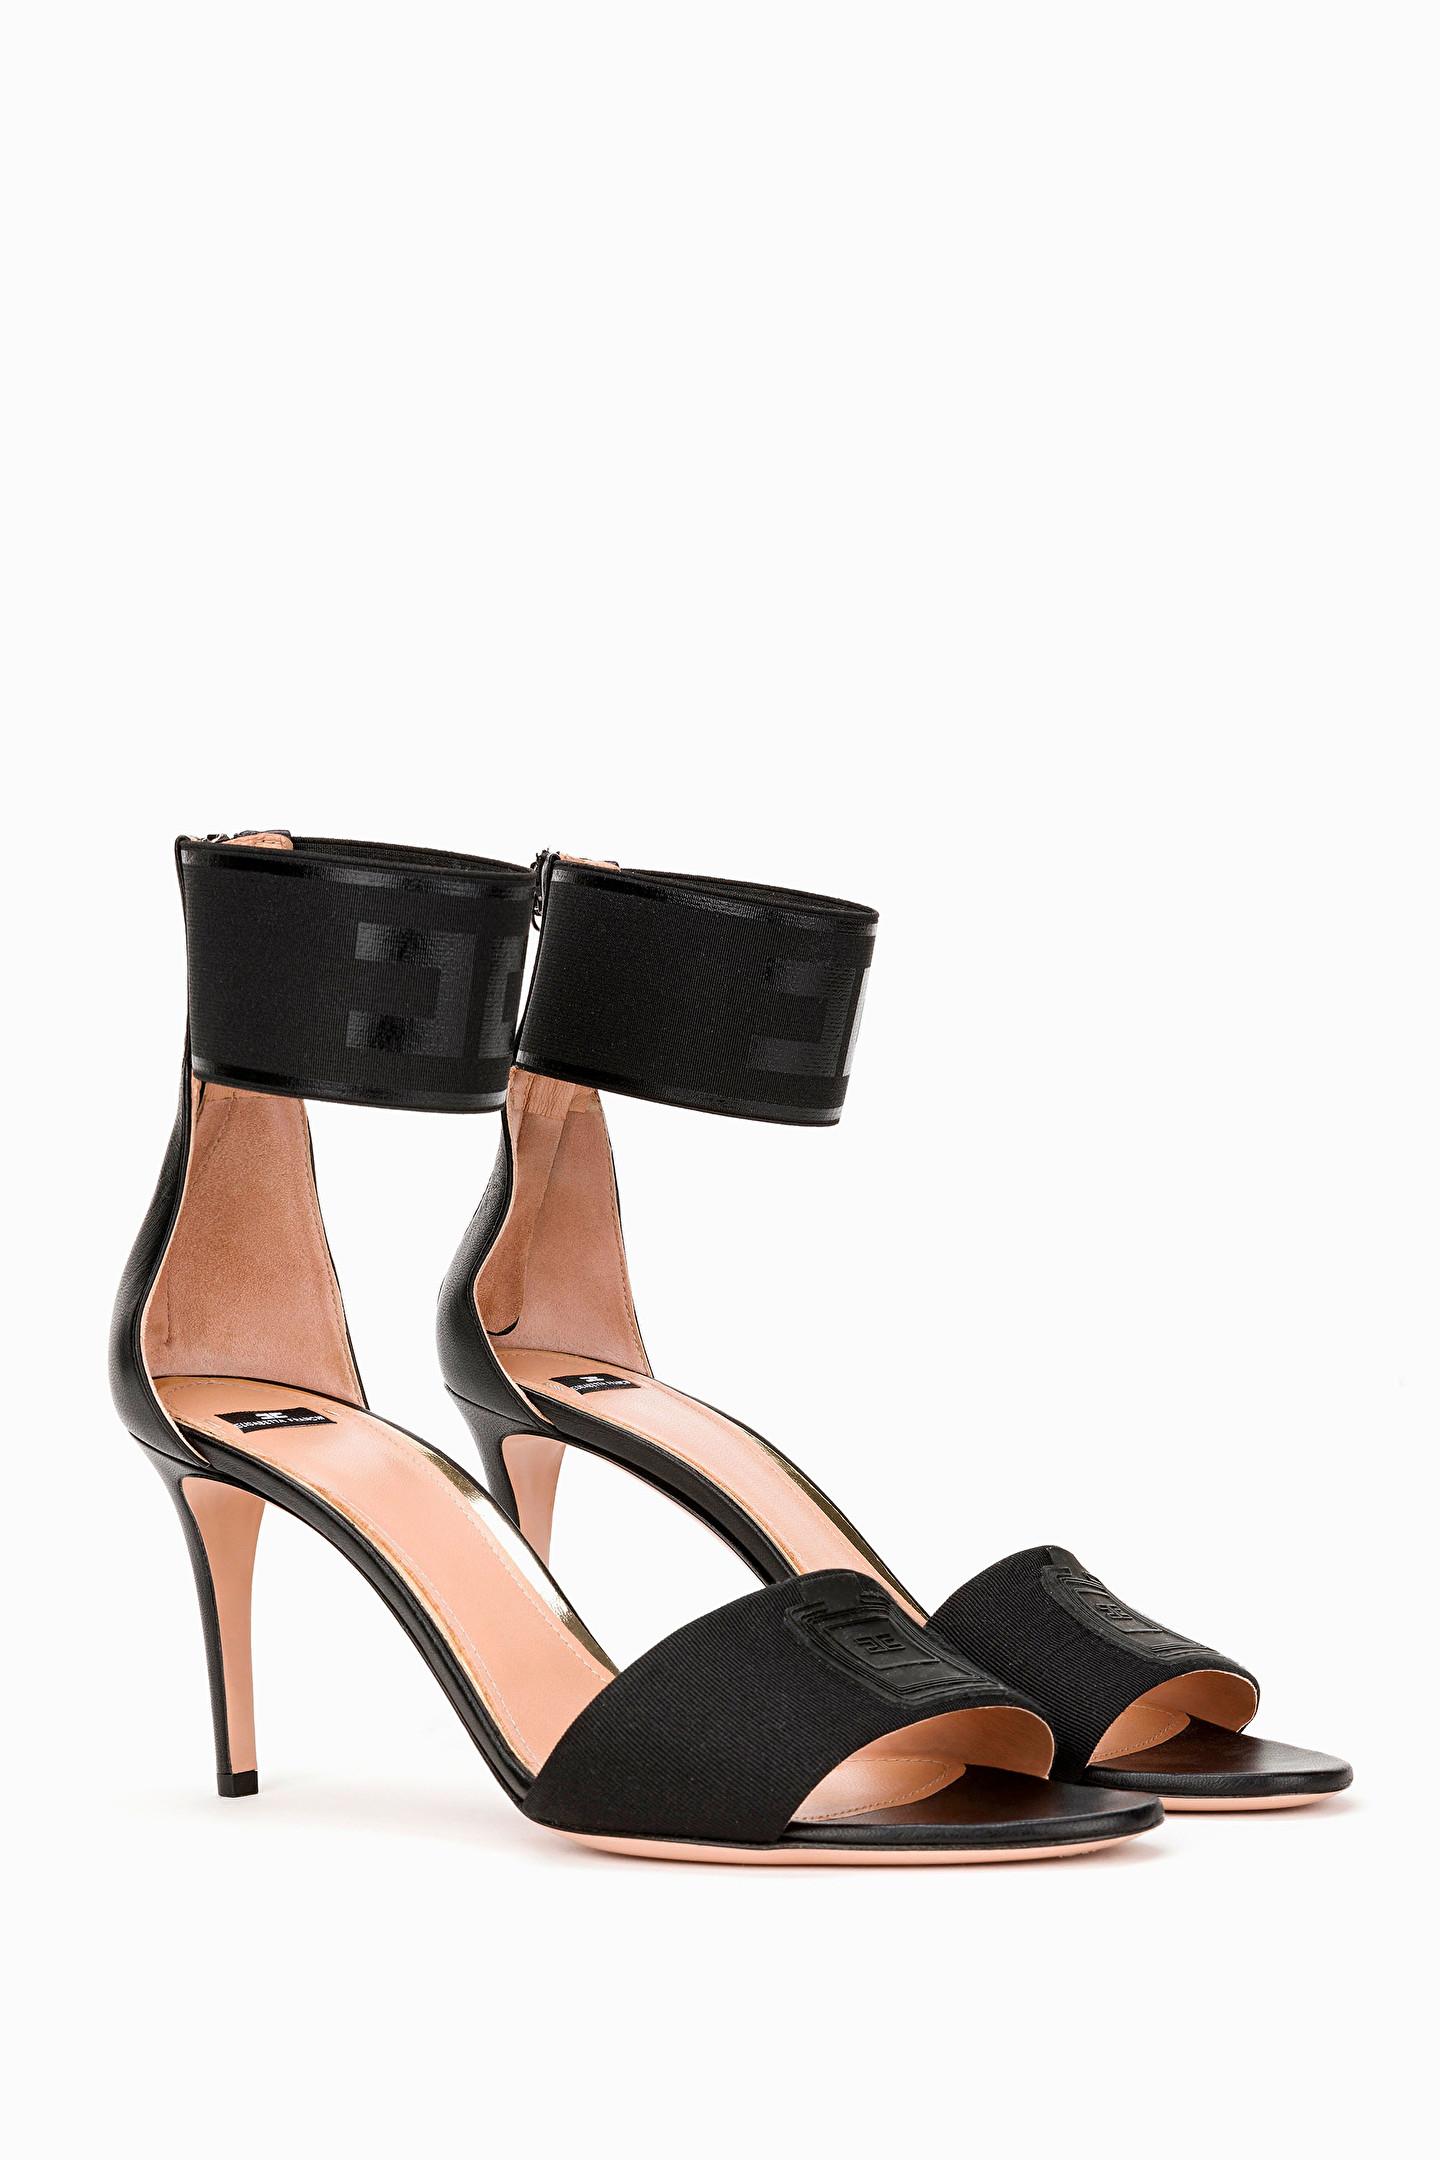 sports shoes a8153 2ee68 Sandalo con placca logata Elisabetta Franchi Spring/summer 2019